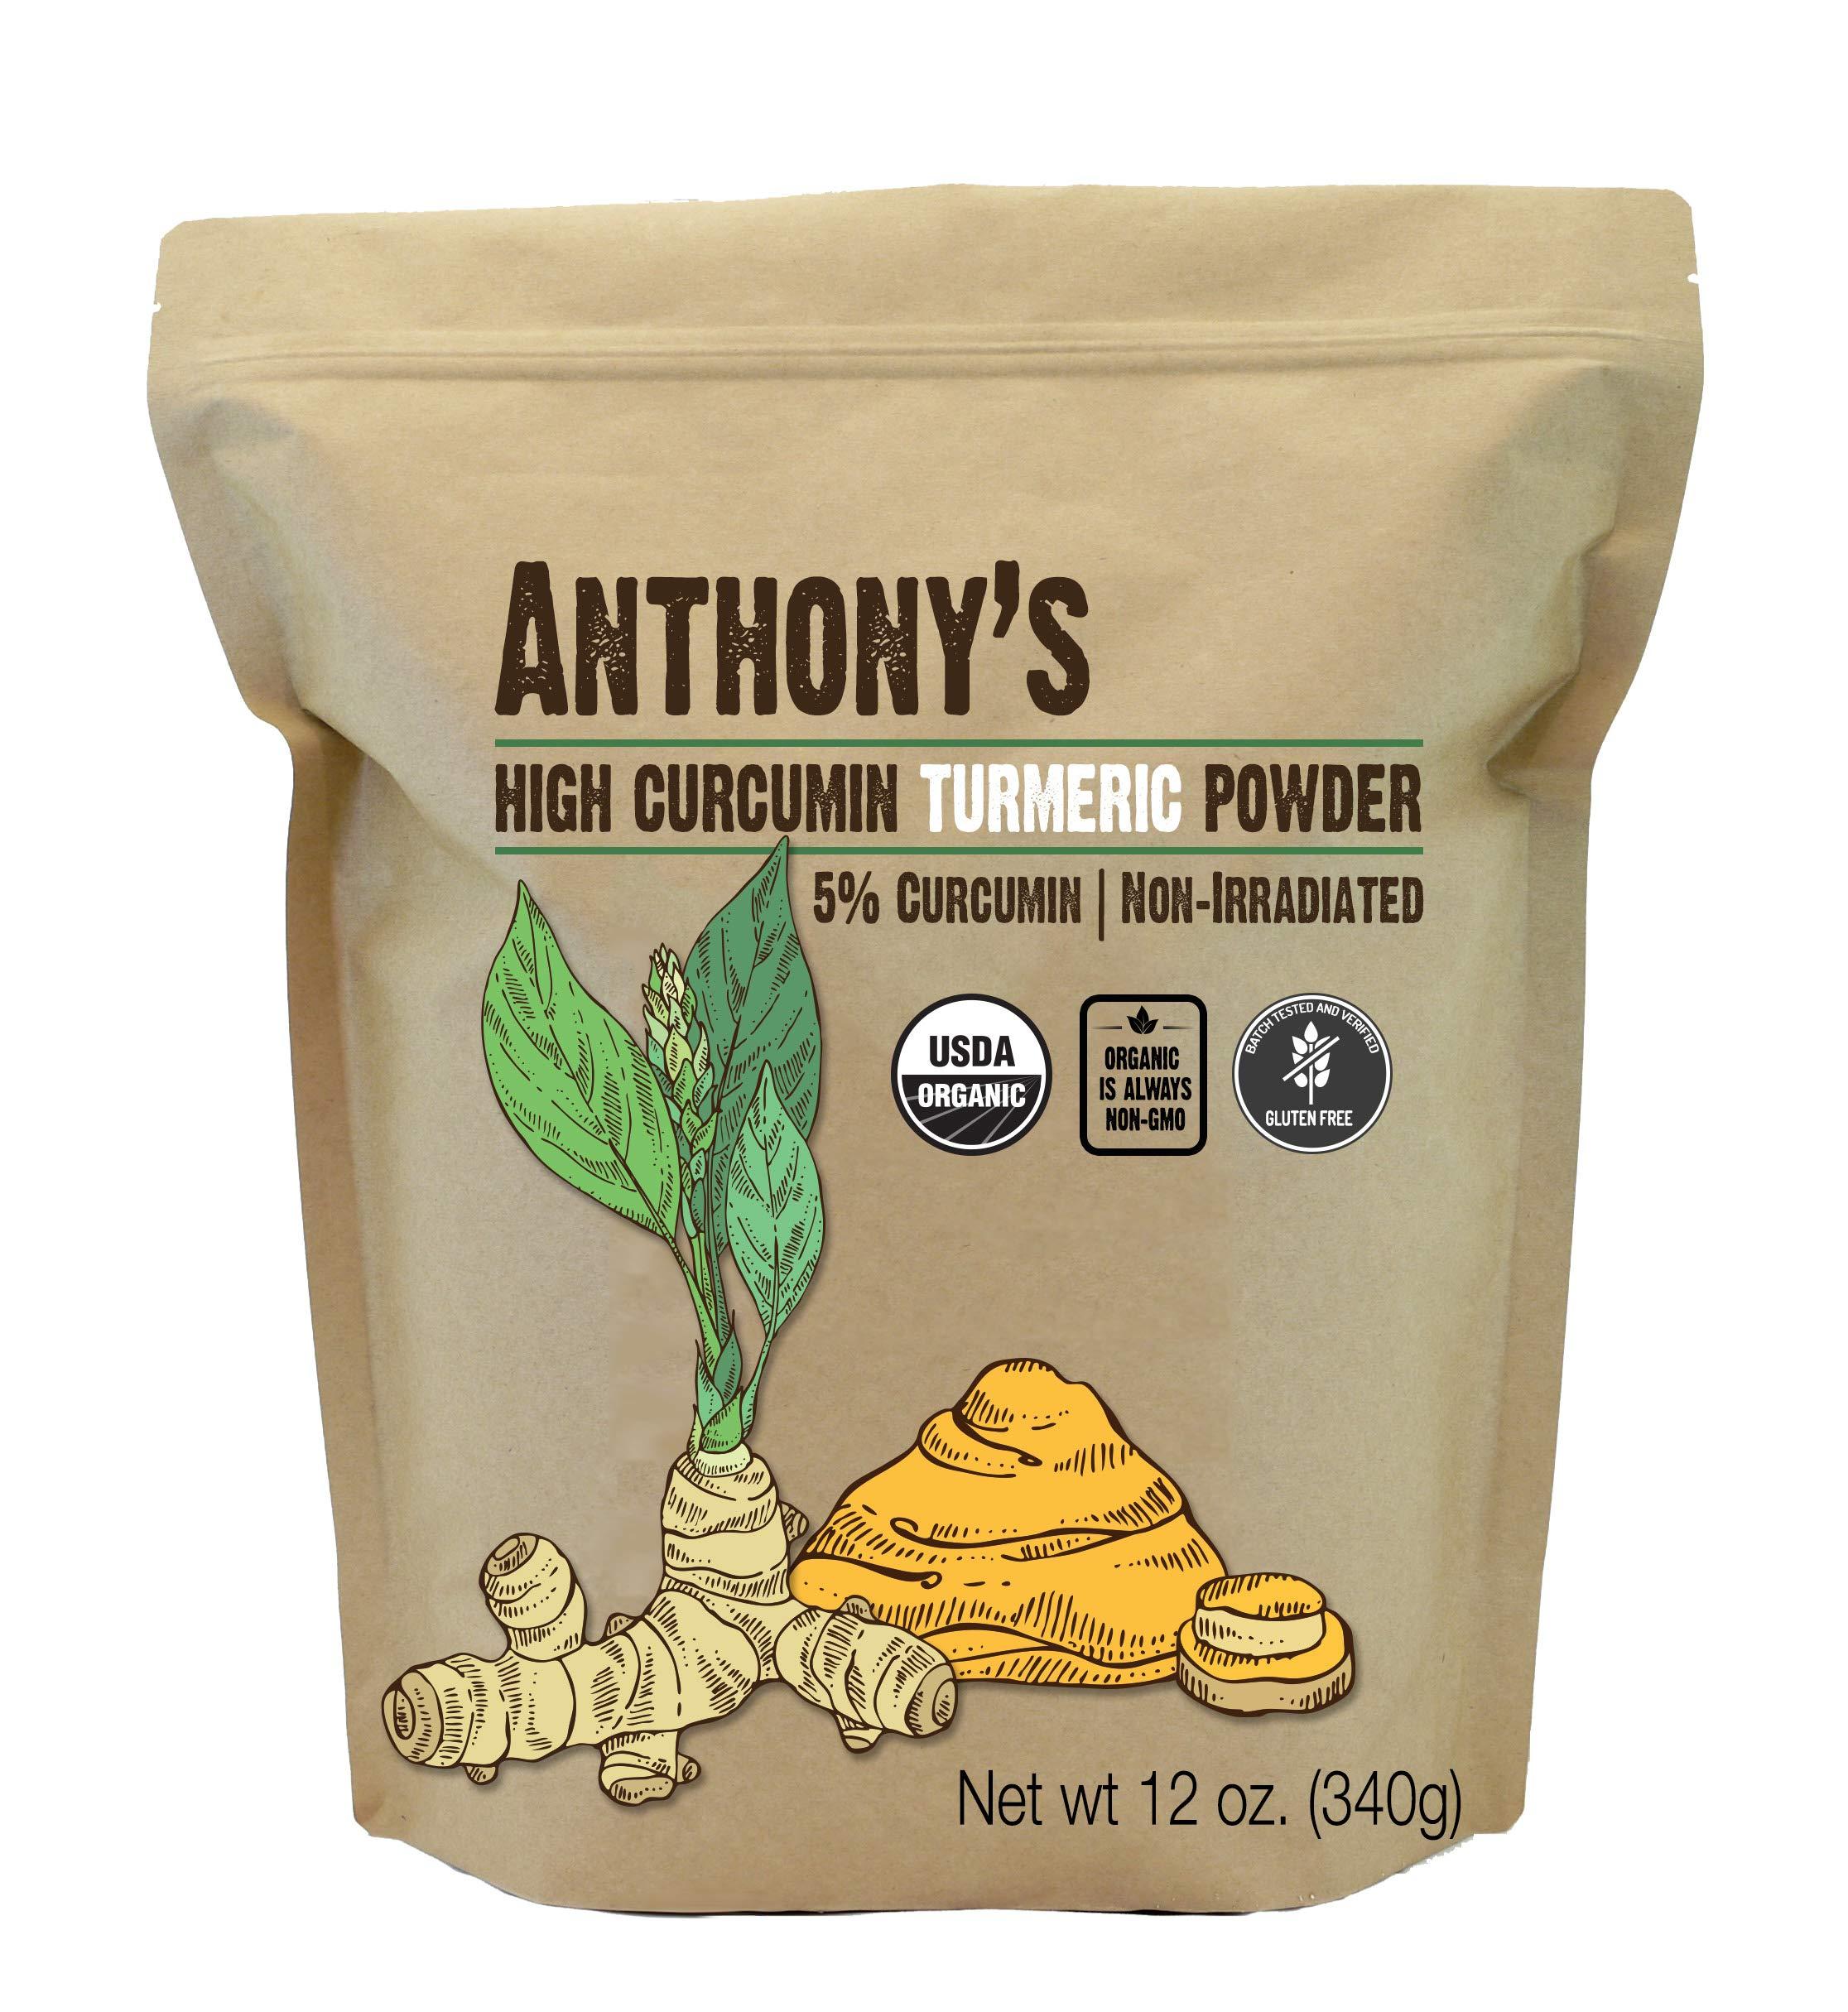 Anthony's Organic High Curcumin Turmeric Powder (12oz) Batch Tested Gluten Free, Non-GMO, Non-Irradiated